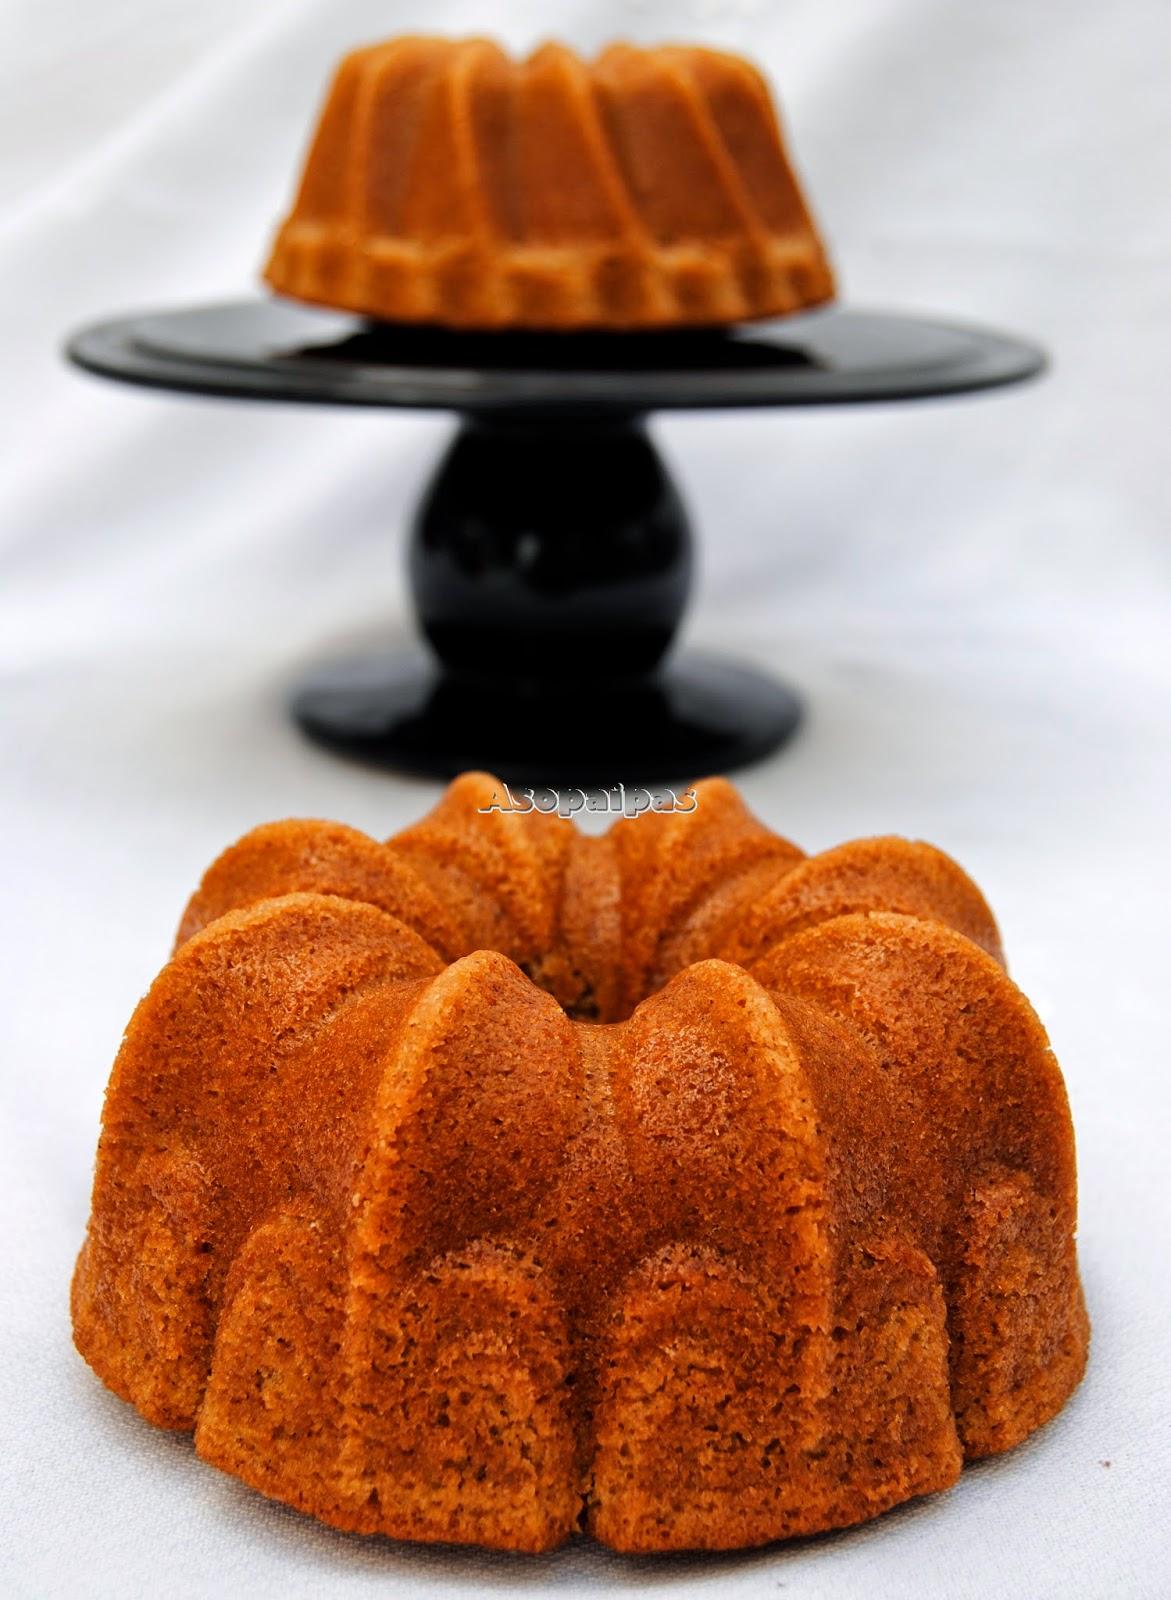 Bizcocho casero Bundt Cake de Arroz con Leche